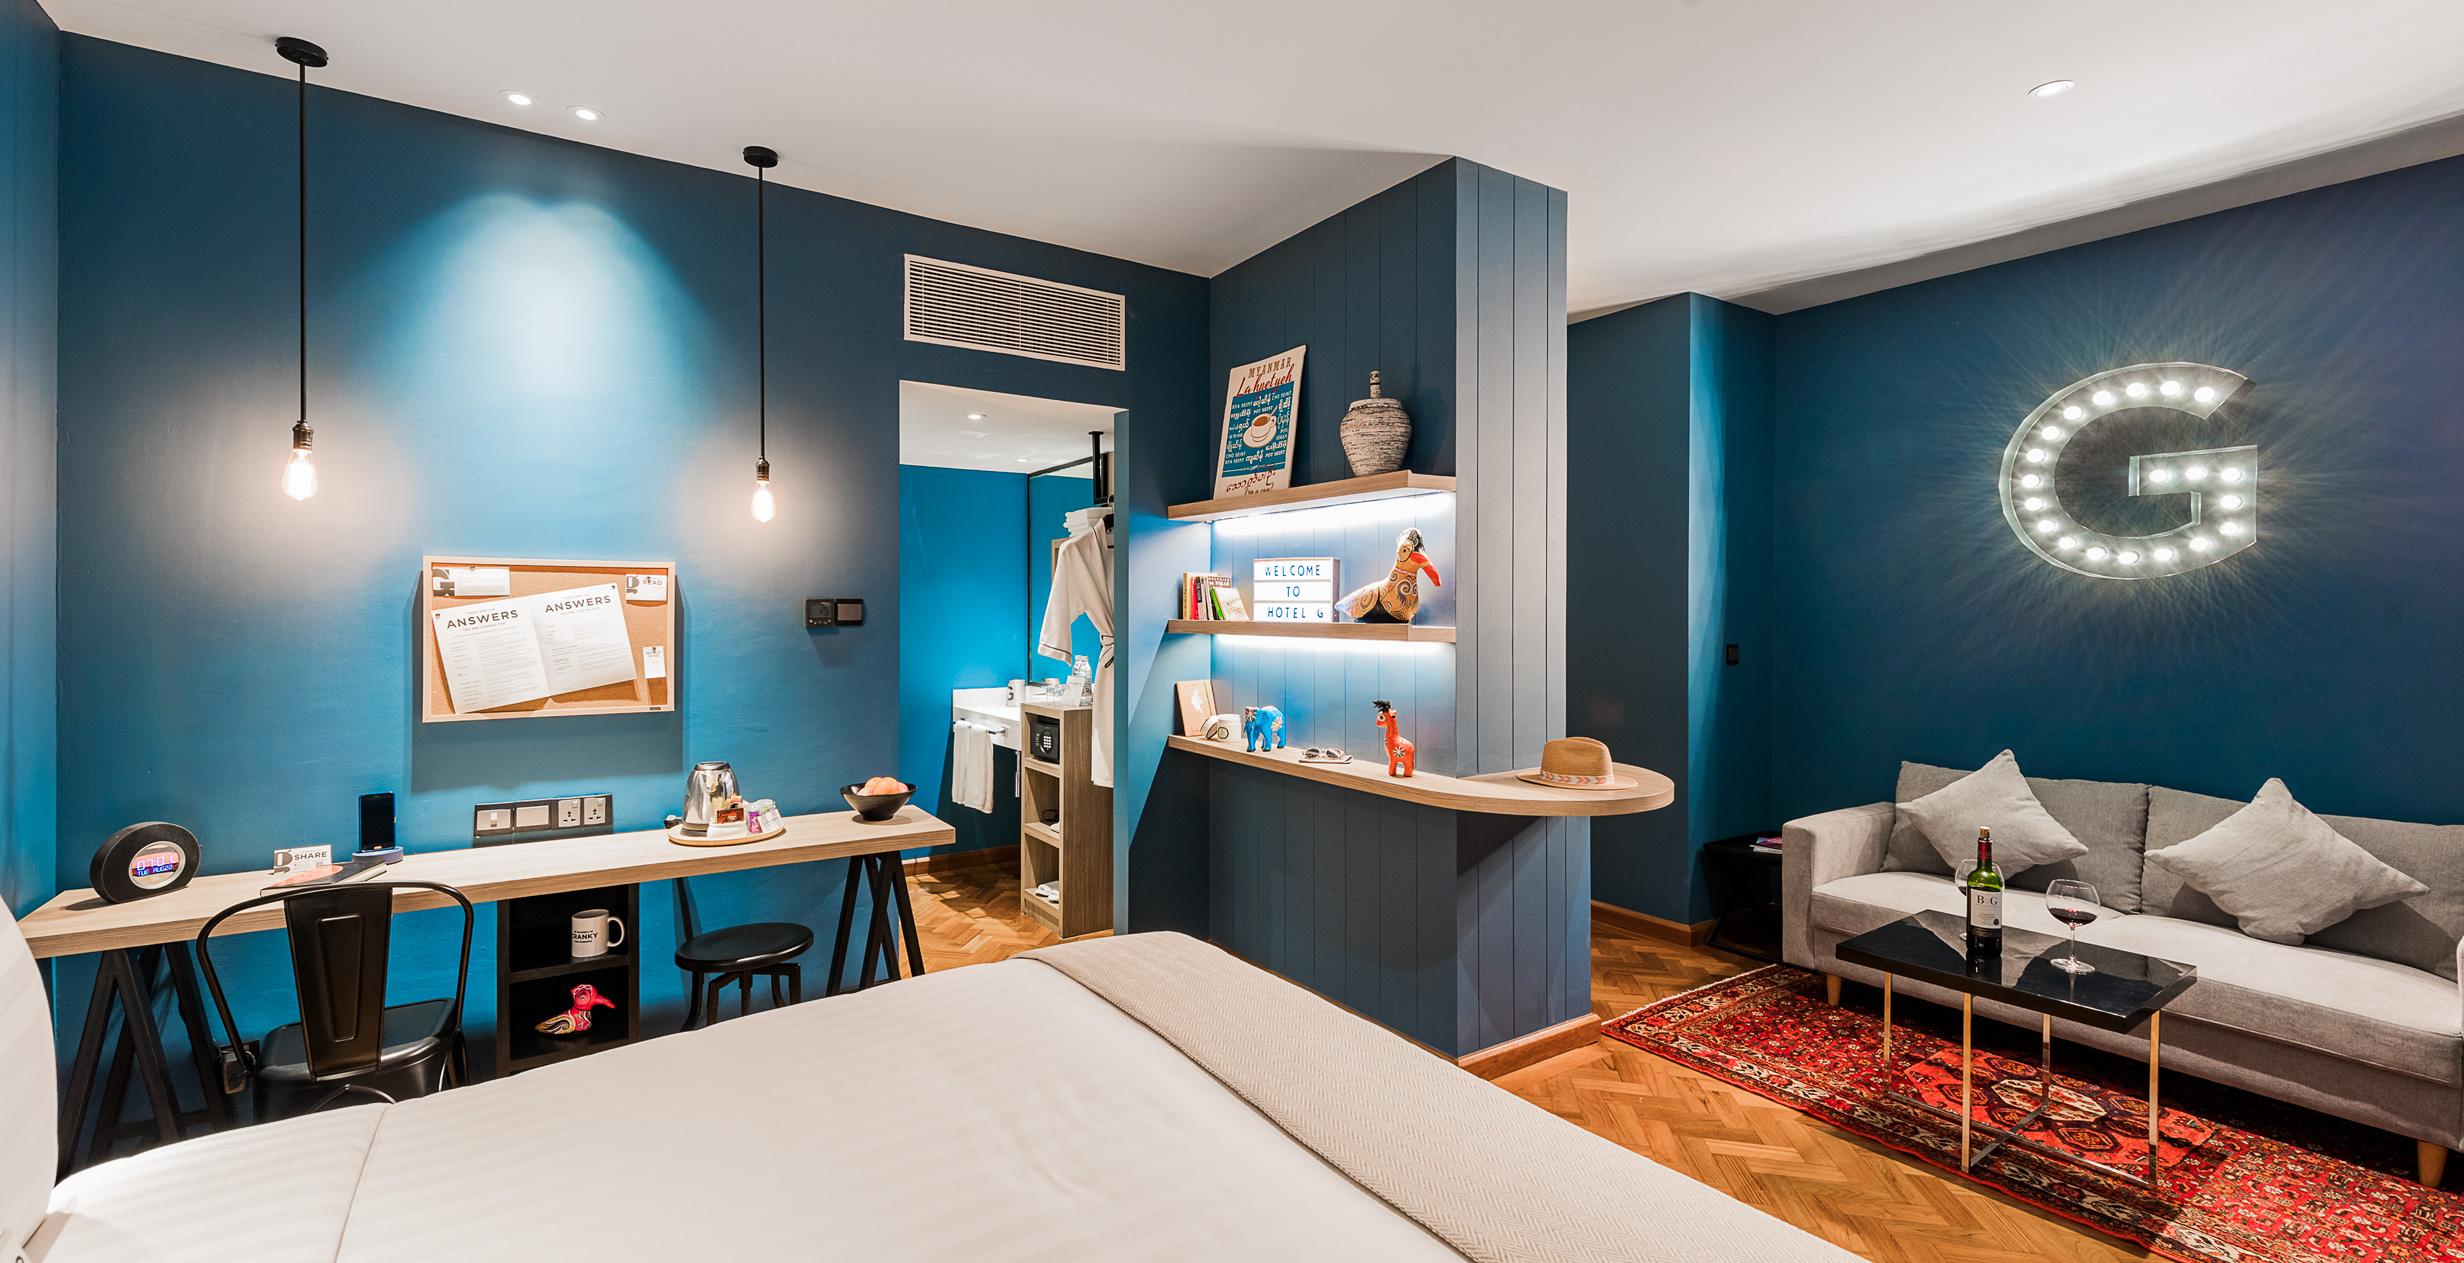 Greatest Room – Hotel G Yangon